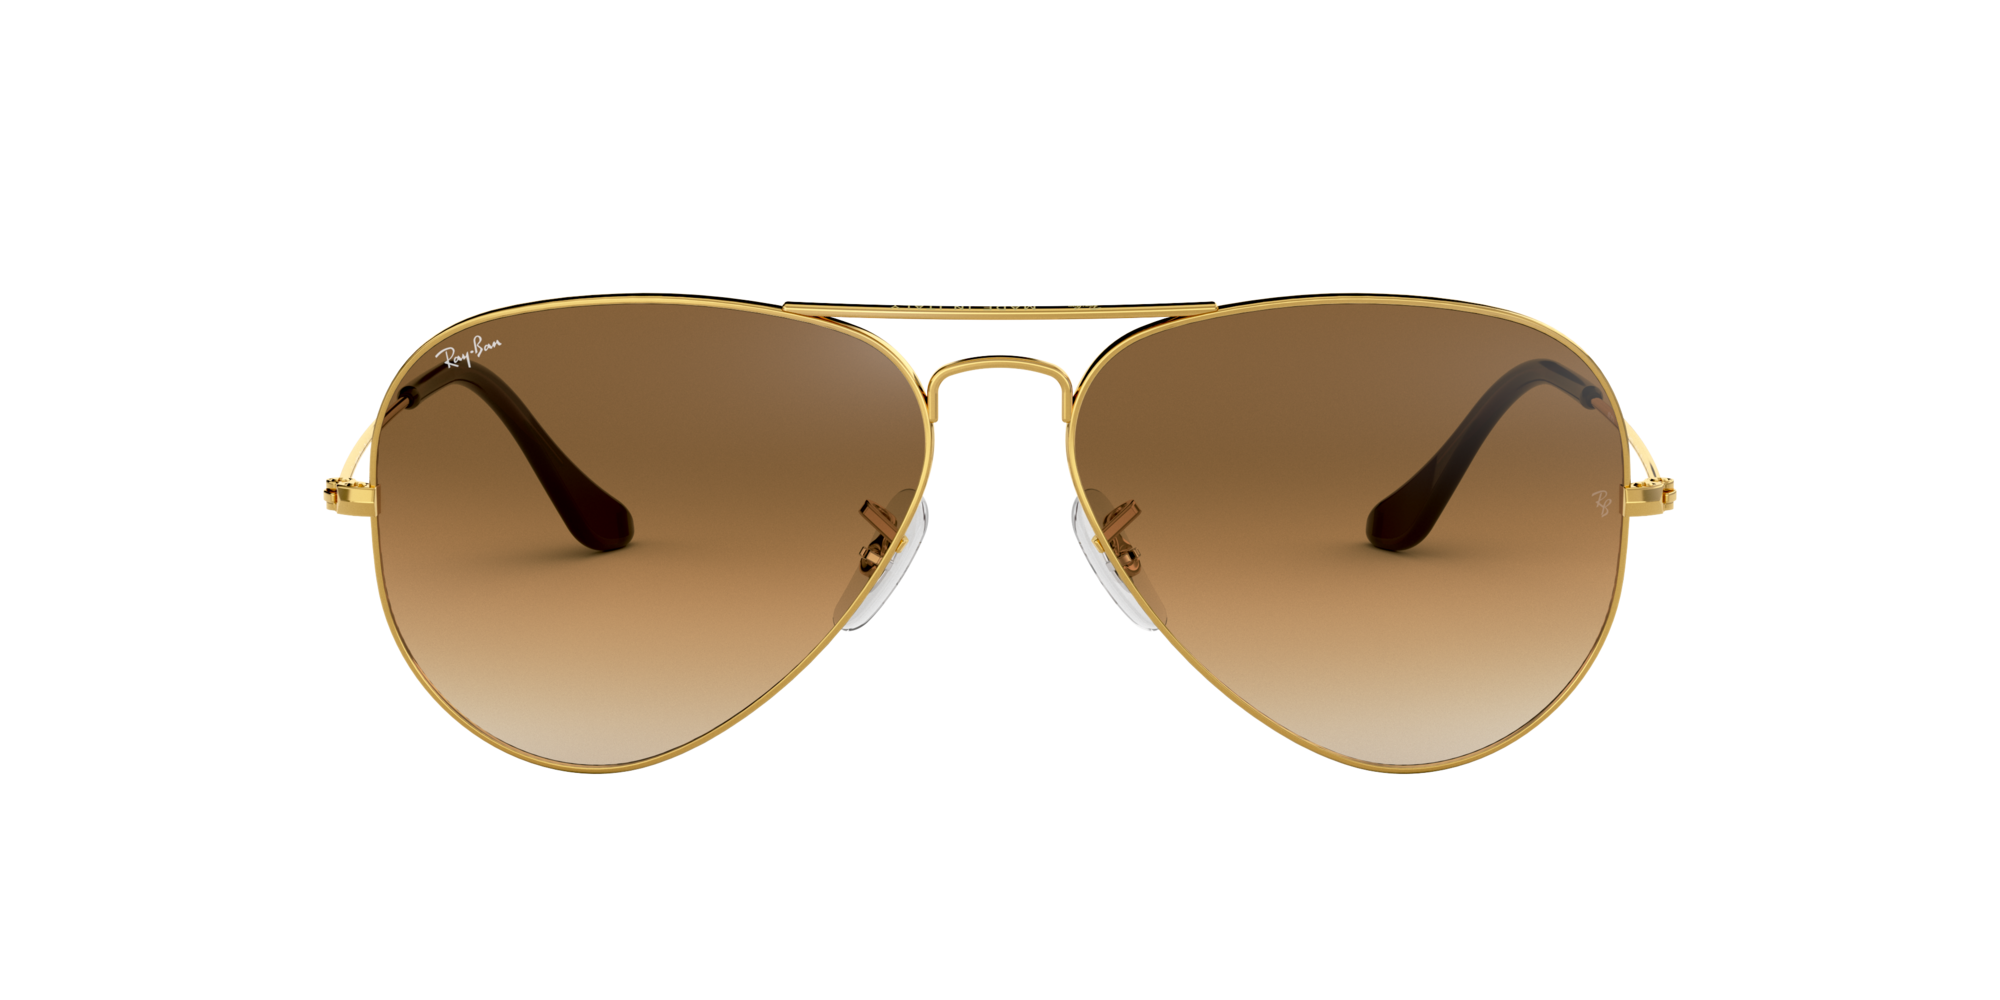 Image for RB3025 58 ORIGINAL AVI from LensCrafters | Glasses, Prescription Glasses Online, Eyewear